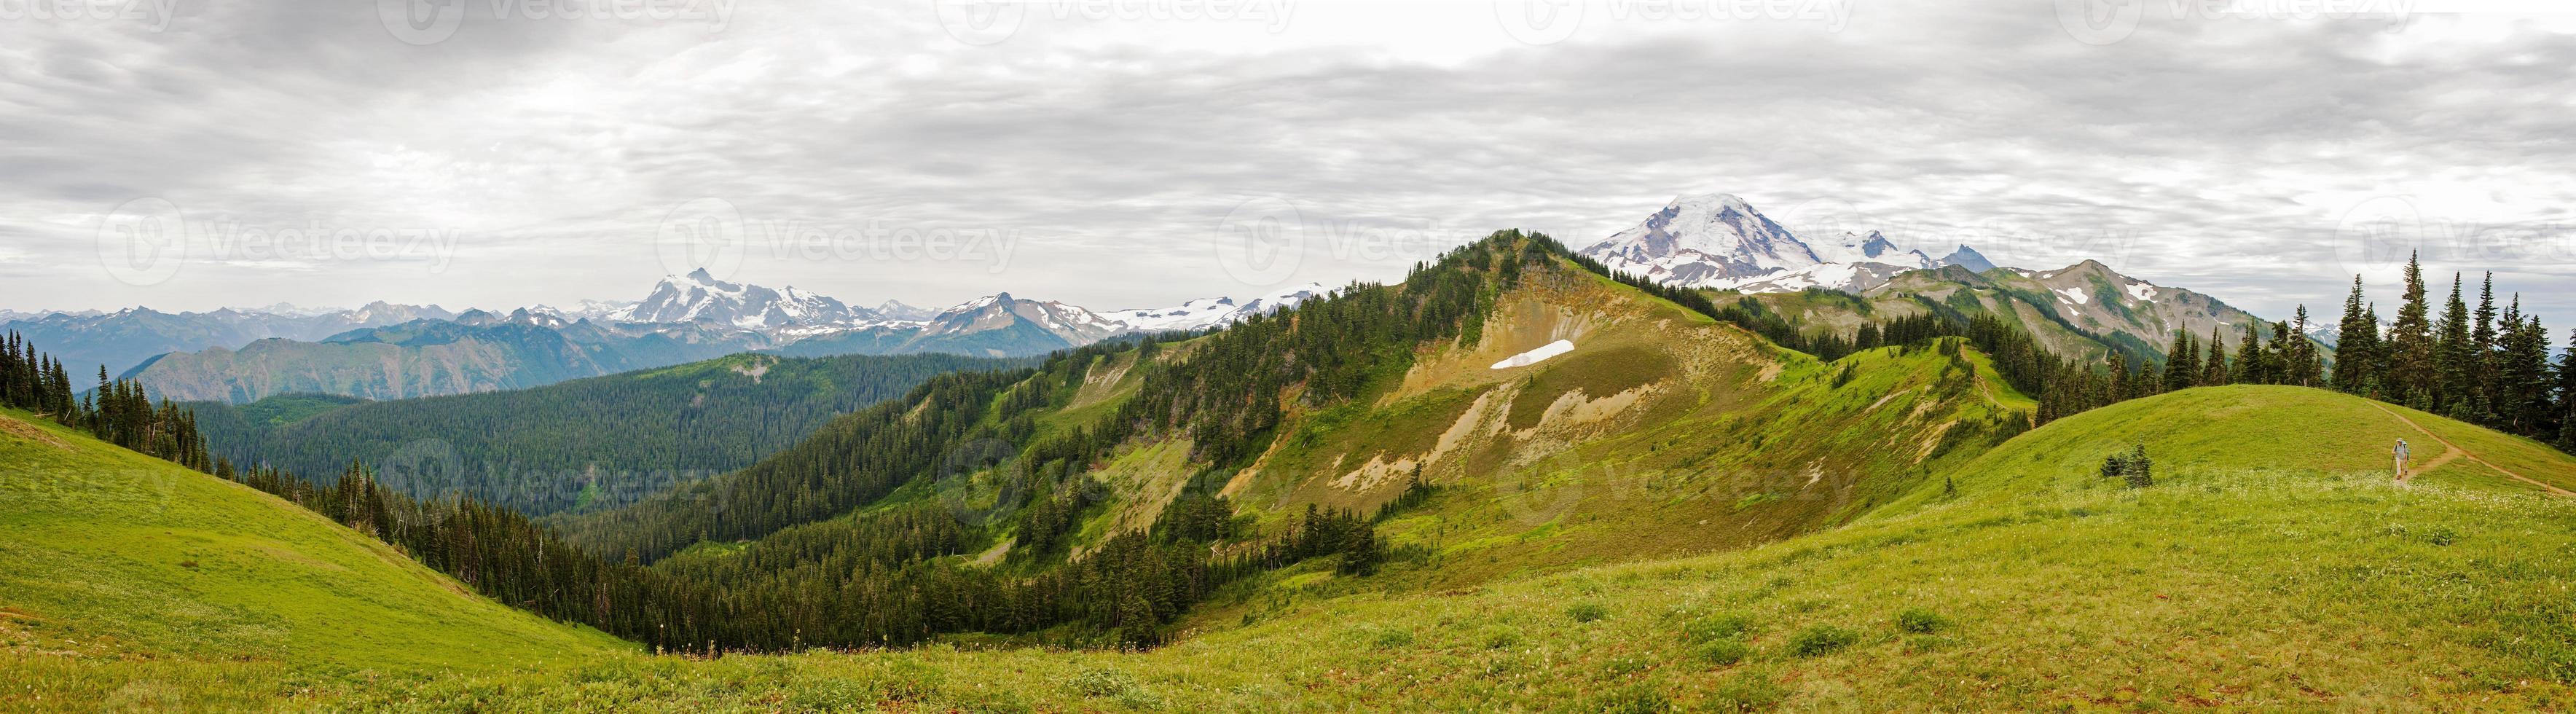 Mt. Baker, Washington. photo